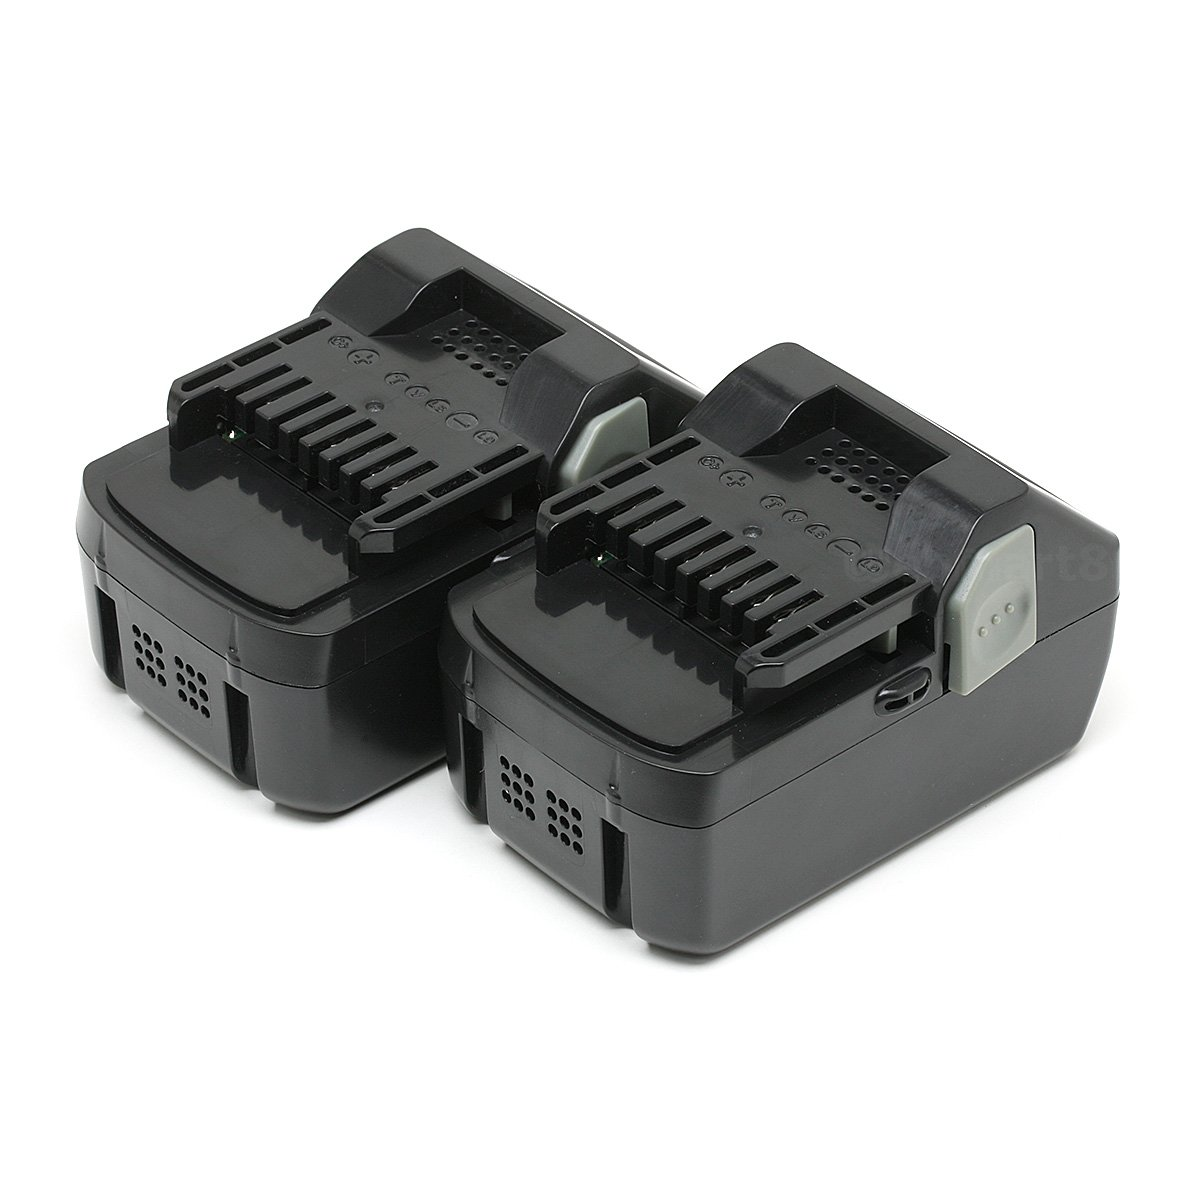 【ATTOZEN】日立工機 BSL1840対応互換バッテリー 18V 4.0Ah 2個セット(HITACHI対応) B06Y65RGSV